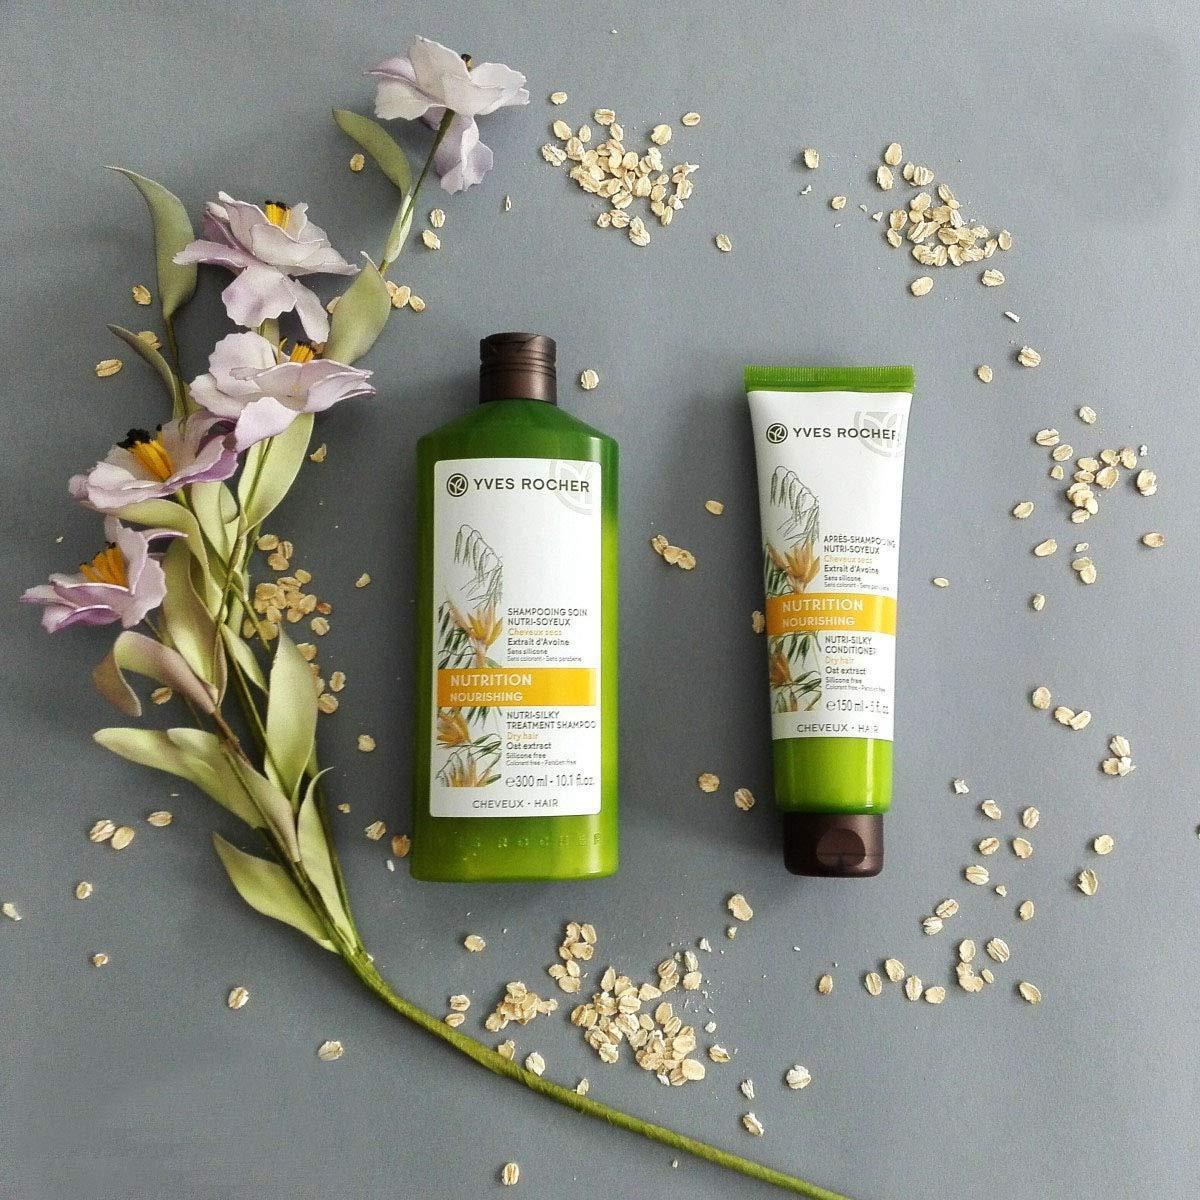 Dầu Xả Yves Rocher Nutrition Nourishing Nutri-Silky Conditioner cho tóc khô